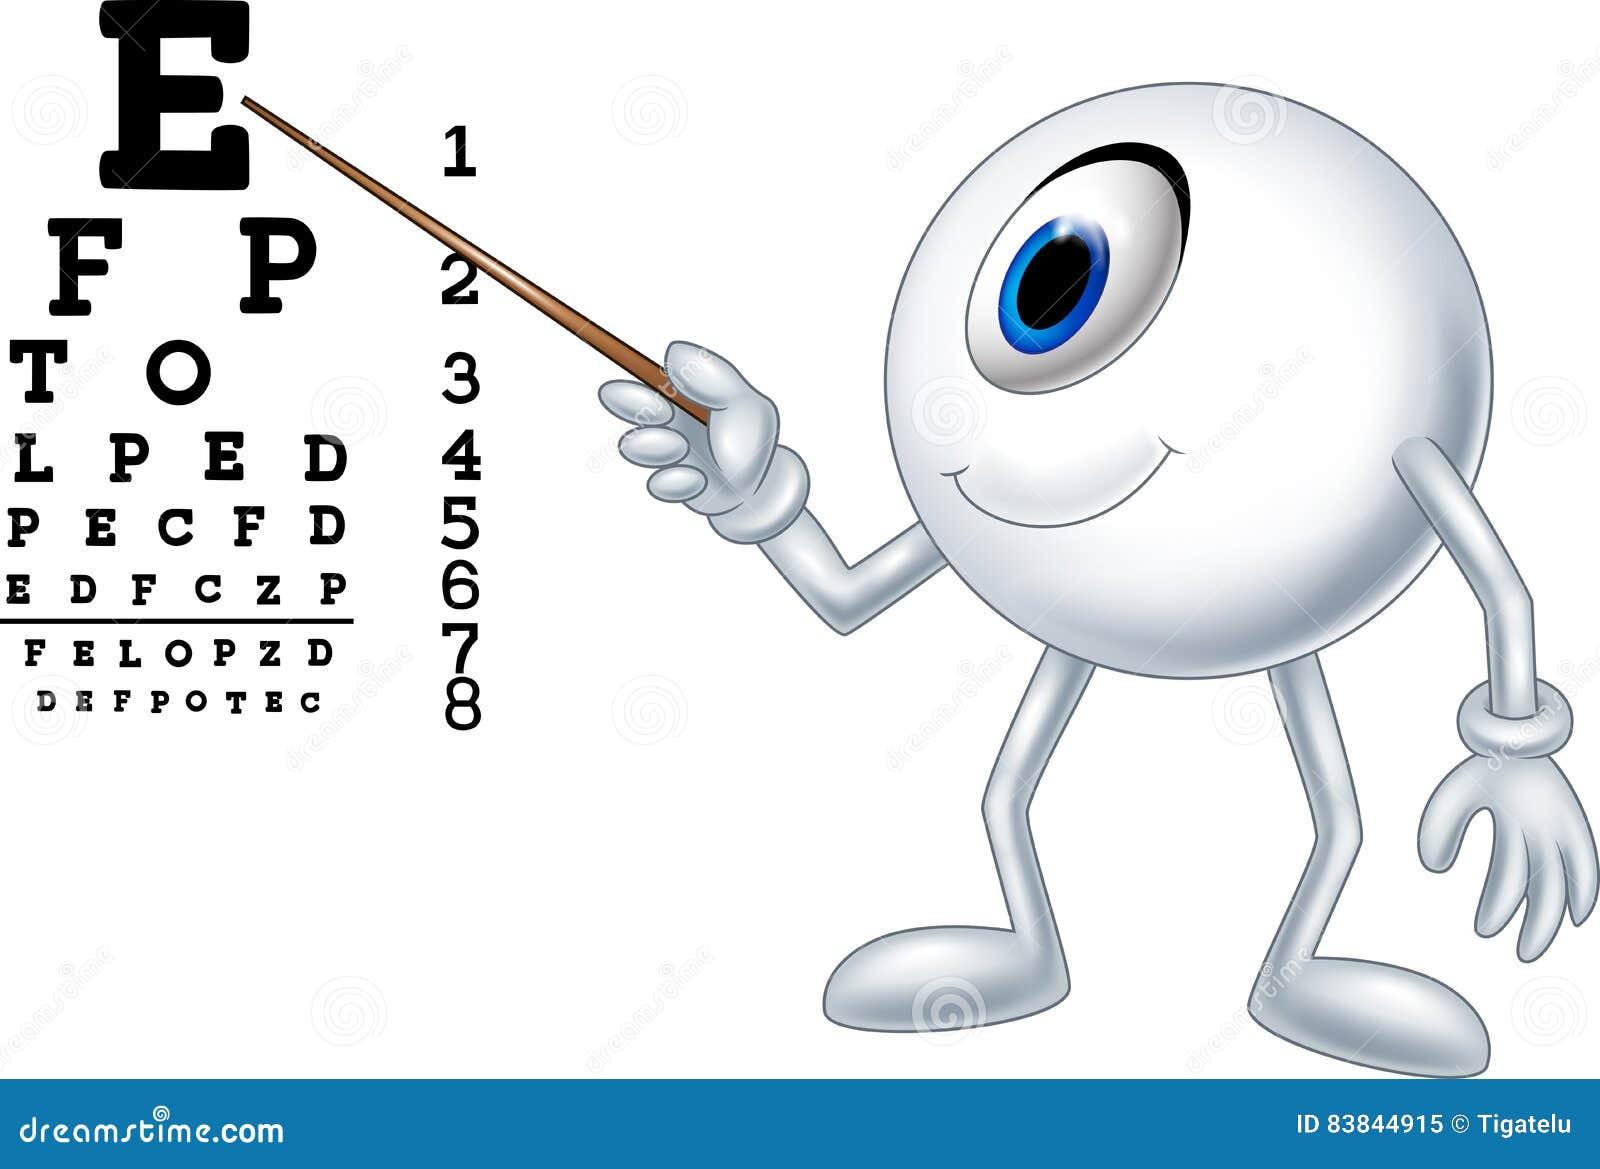 Cartoon eye ball optician pointing to Snellen chart